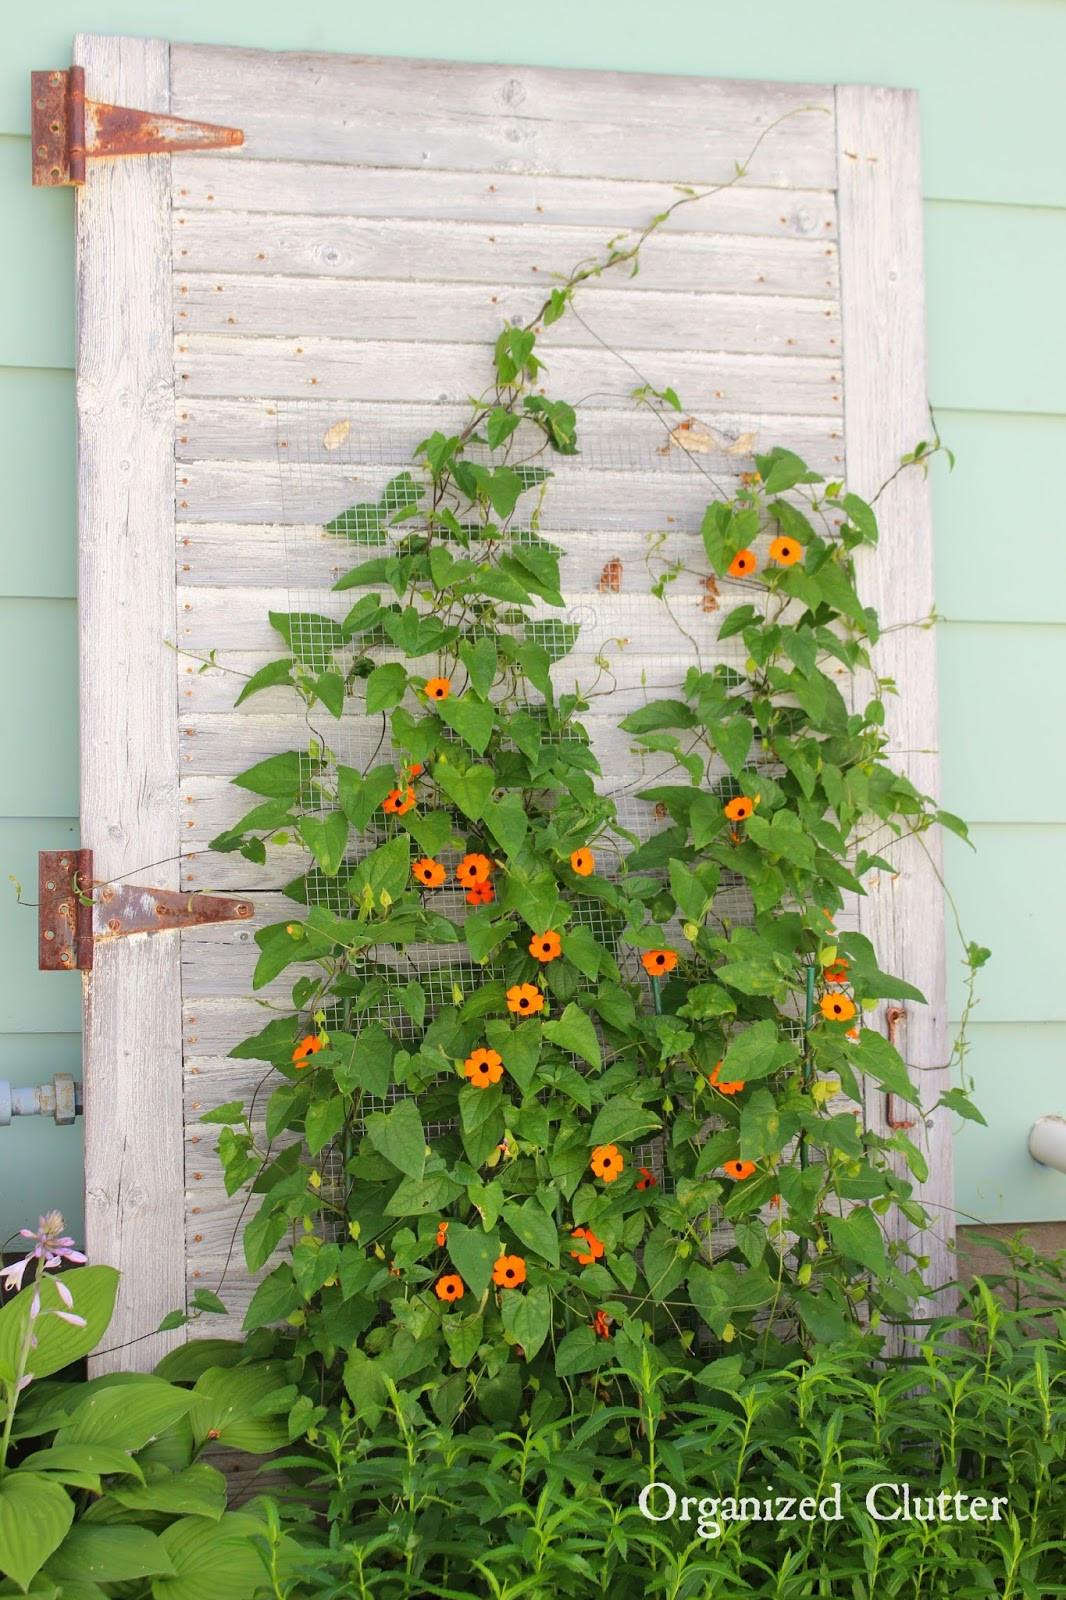 Outdoor Landscape Decor  My Friend Danita s Rustic Garden Decor